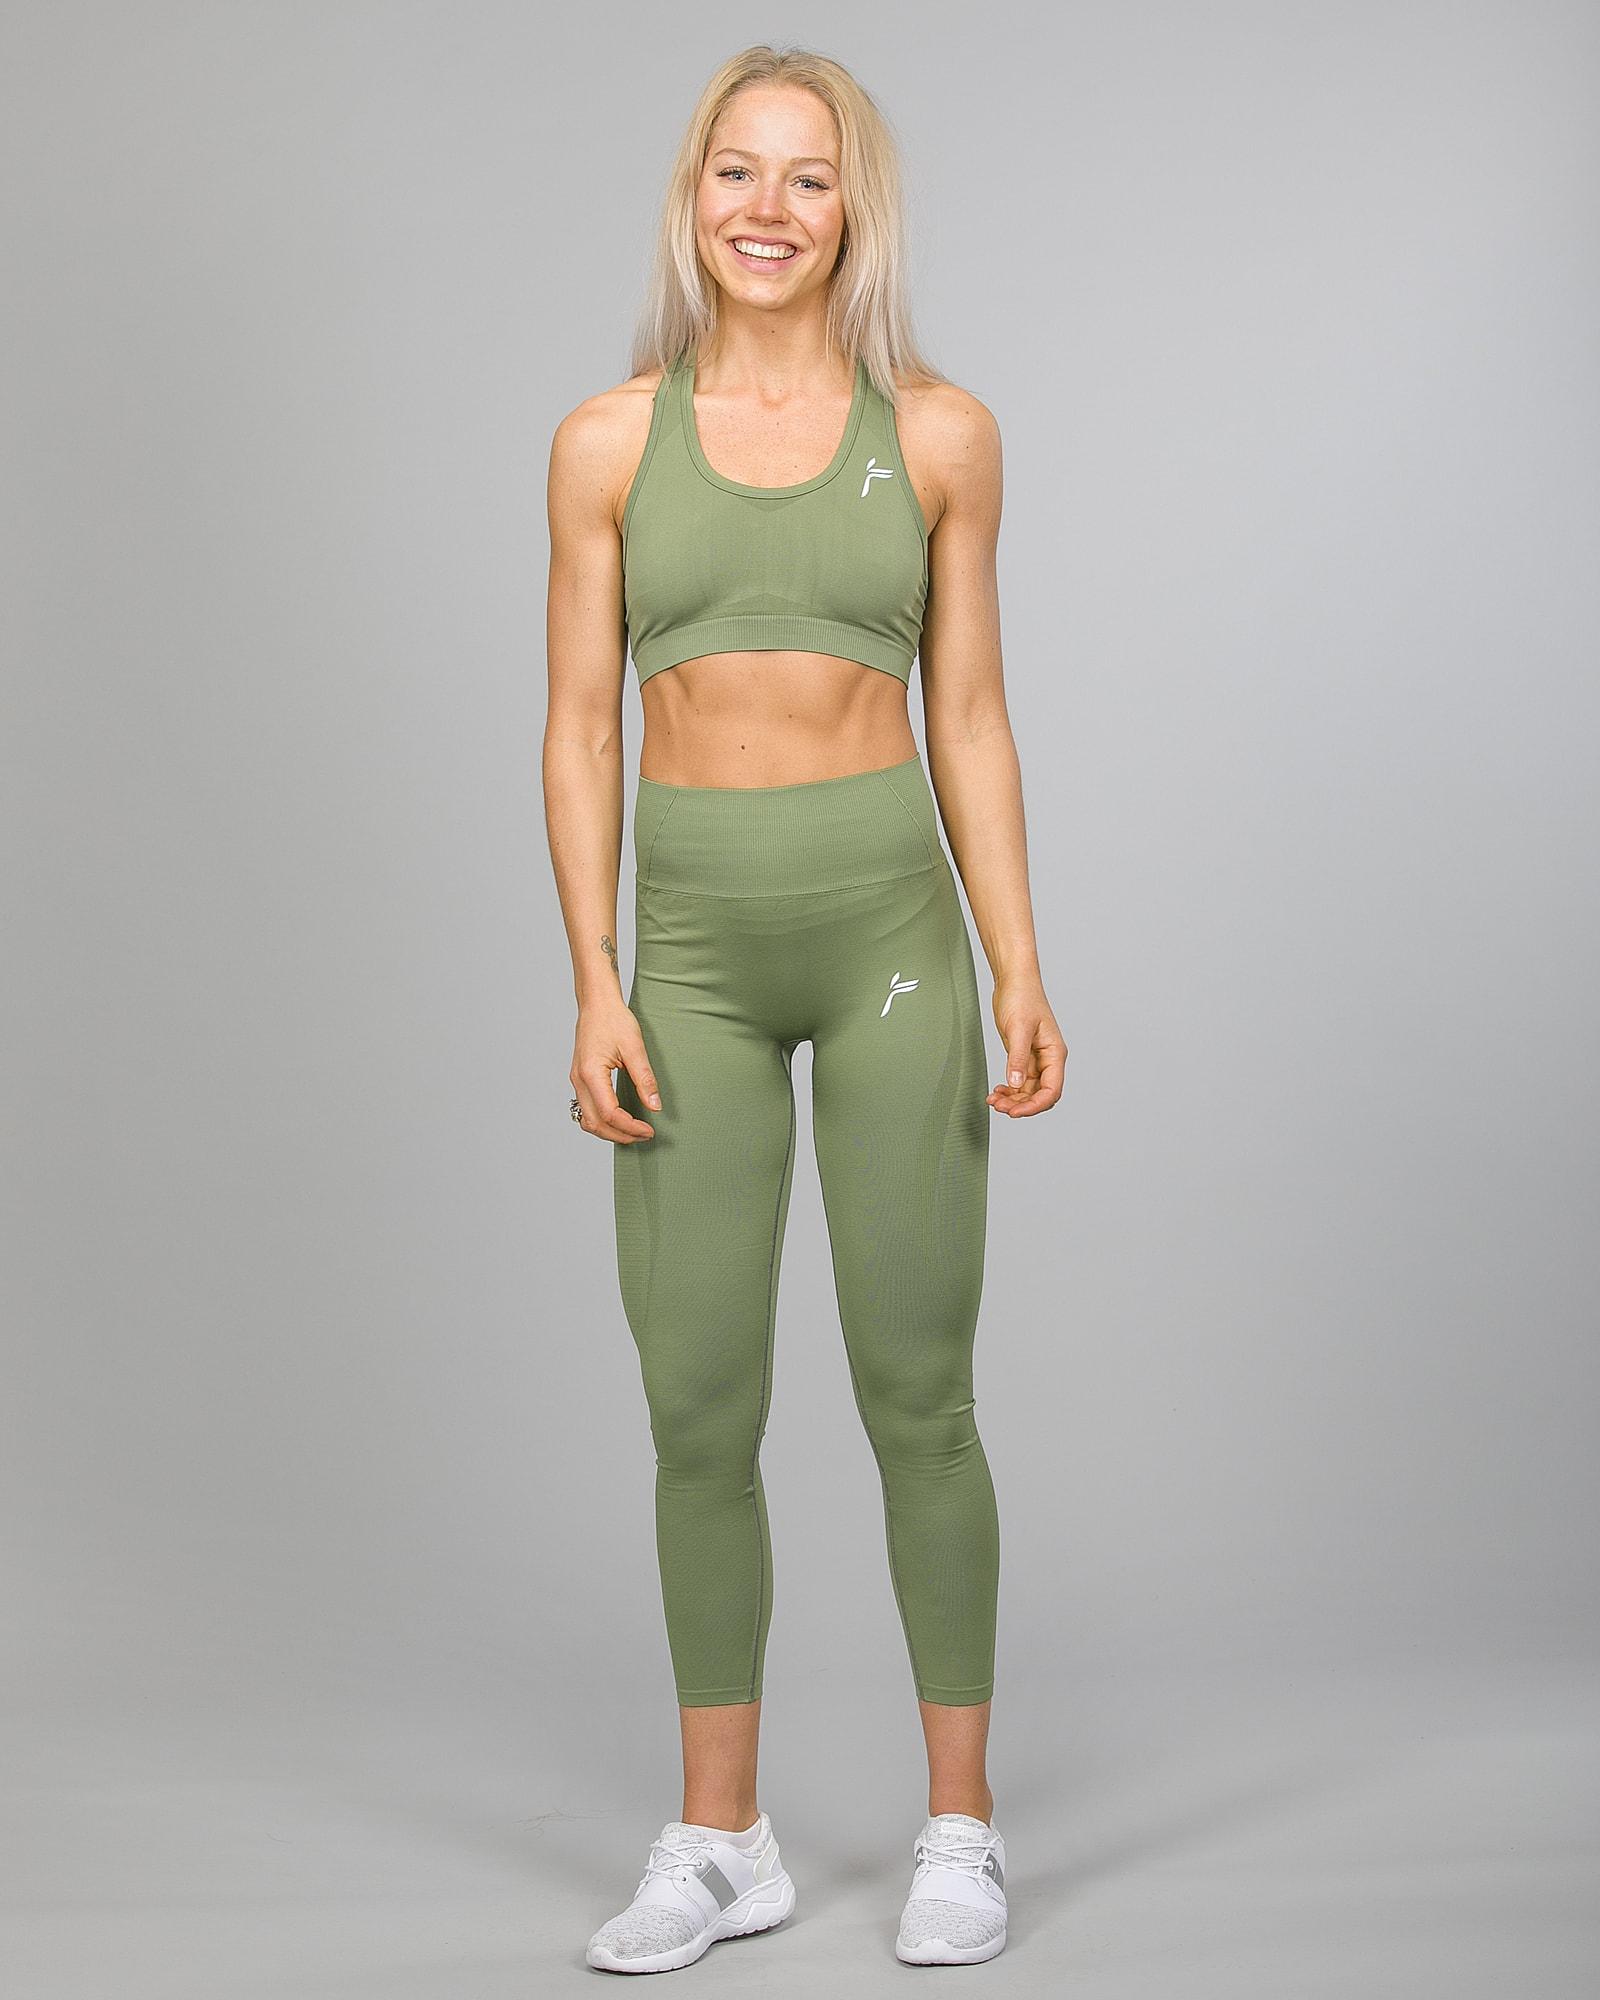 amme Vortex Legging vhwl-ag and Drop It Sports Bra disb-ag Army Green